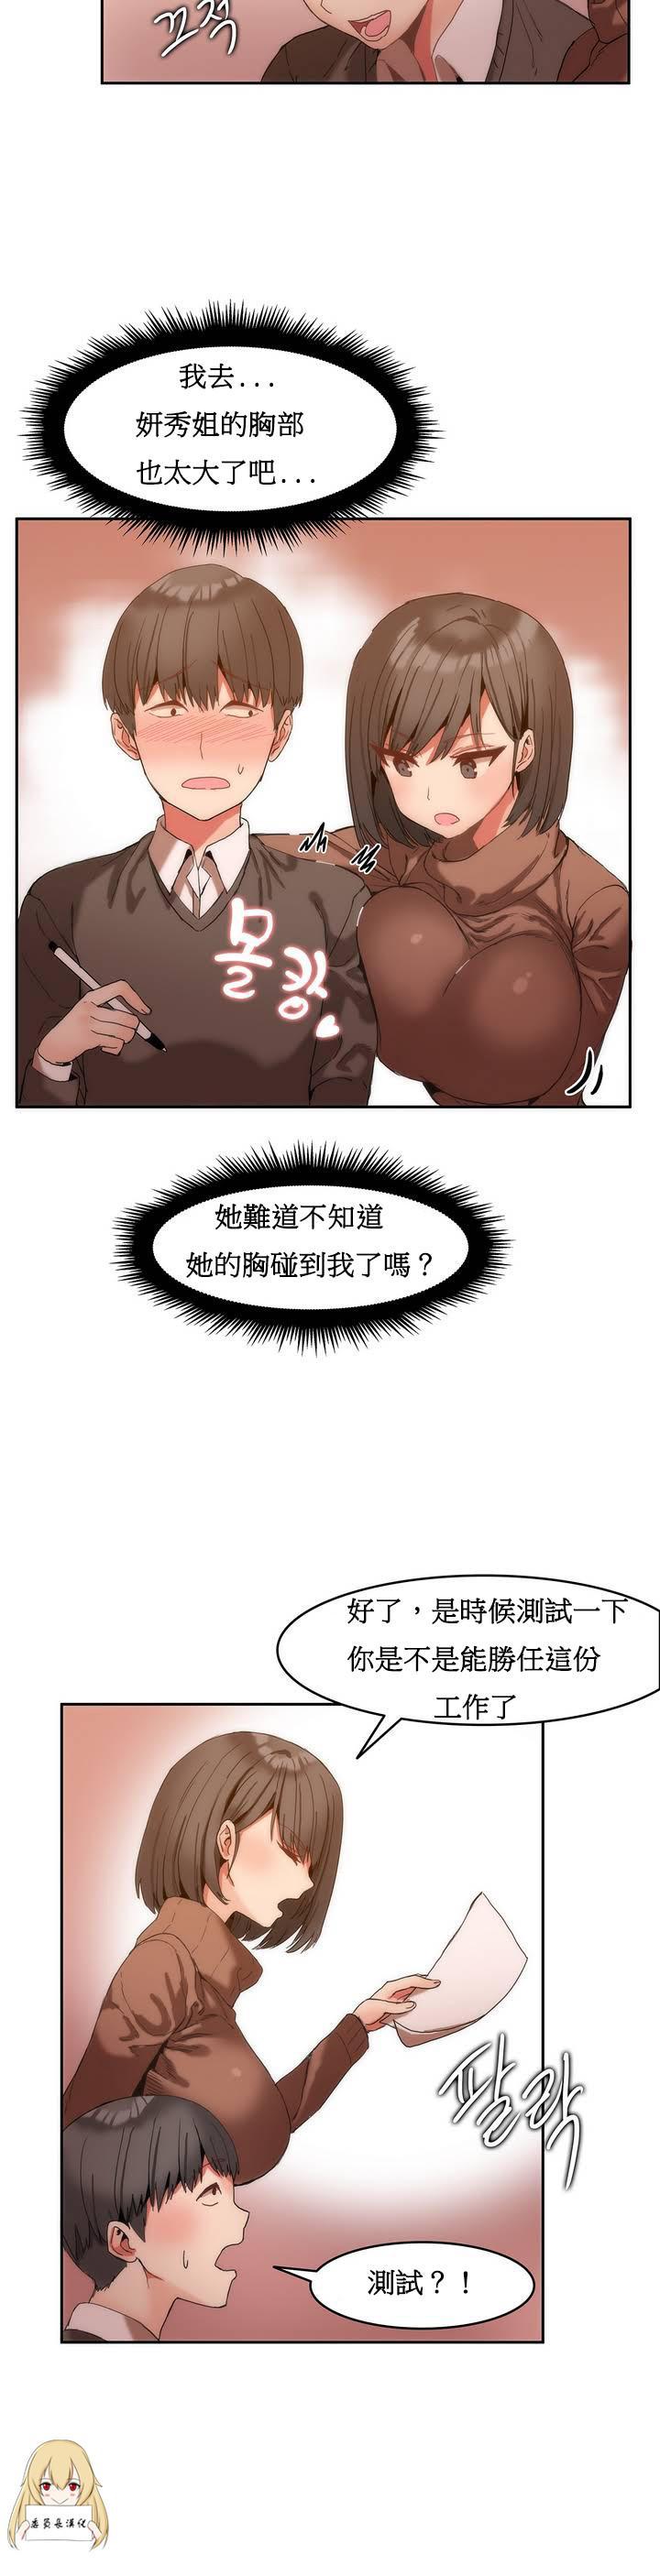 Hahri's Lumpy Boardhouse Ch. 1~18【委員長個人漢化】(持續更新) 20